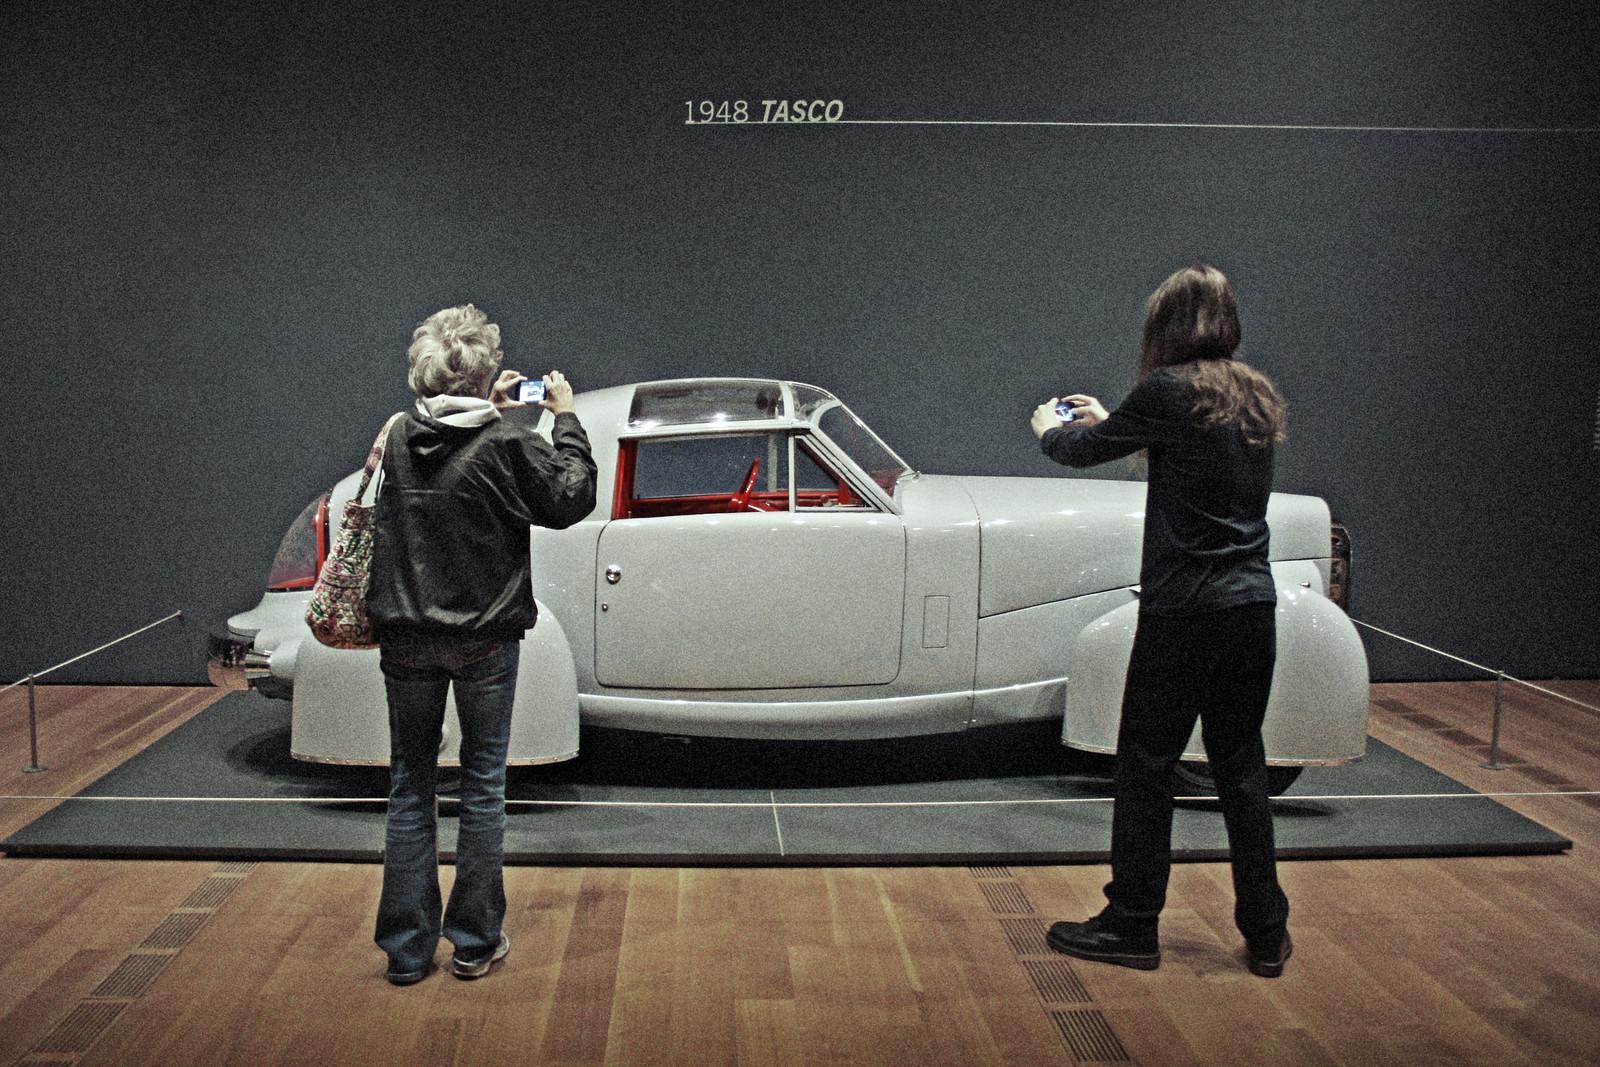 1948 Tasco, Dream Cars Exhibit, High Museum of Art, Summer 2014